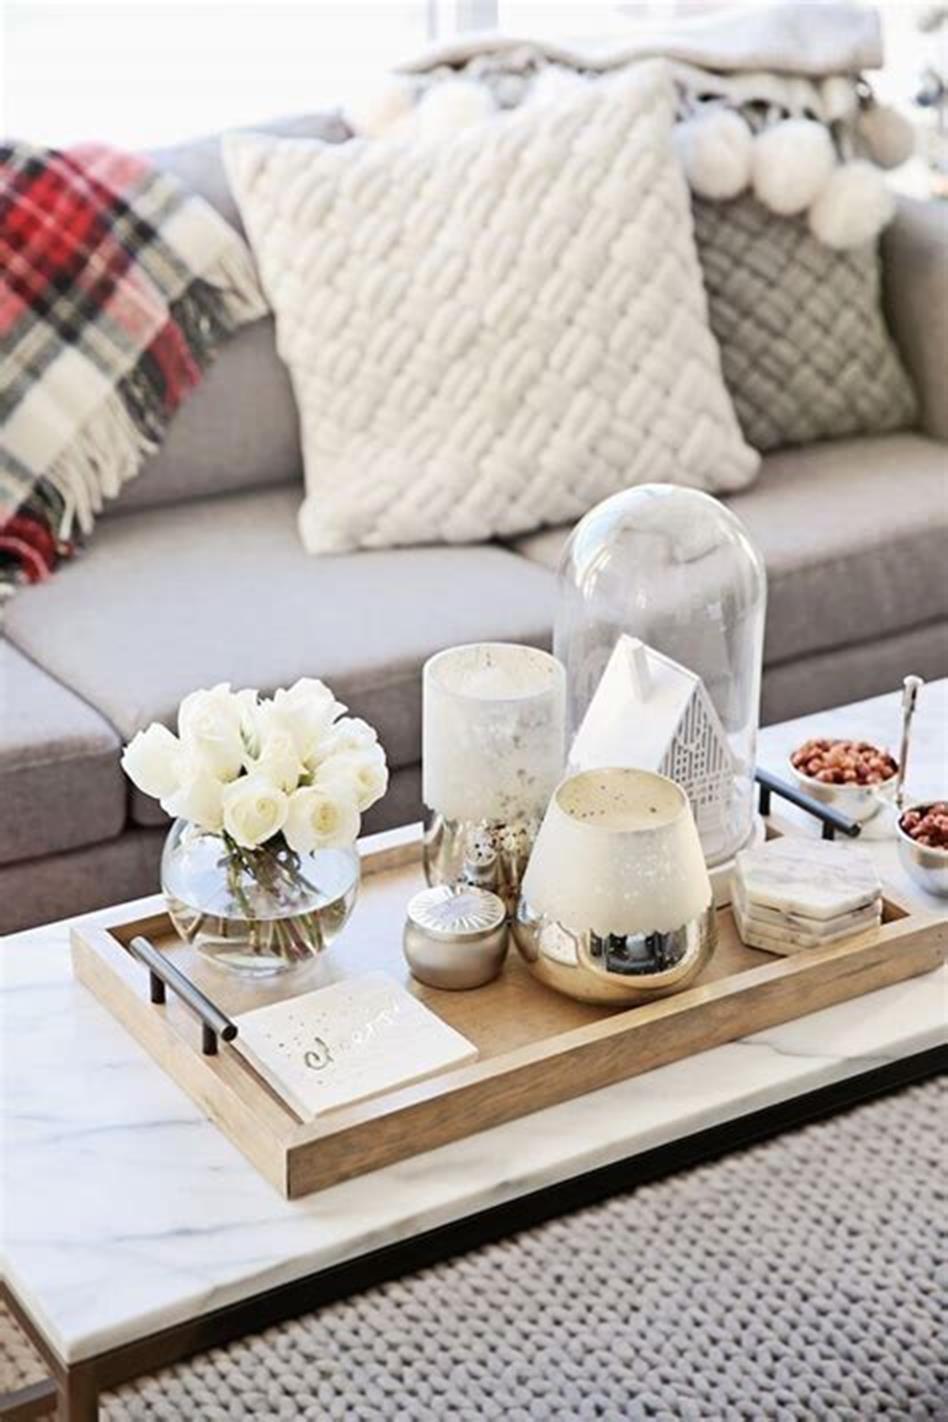 46 Awesome Coffee Table Tray Decor Ideas Coffe Table Decor